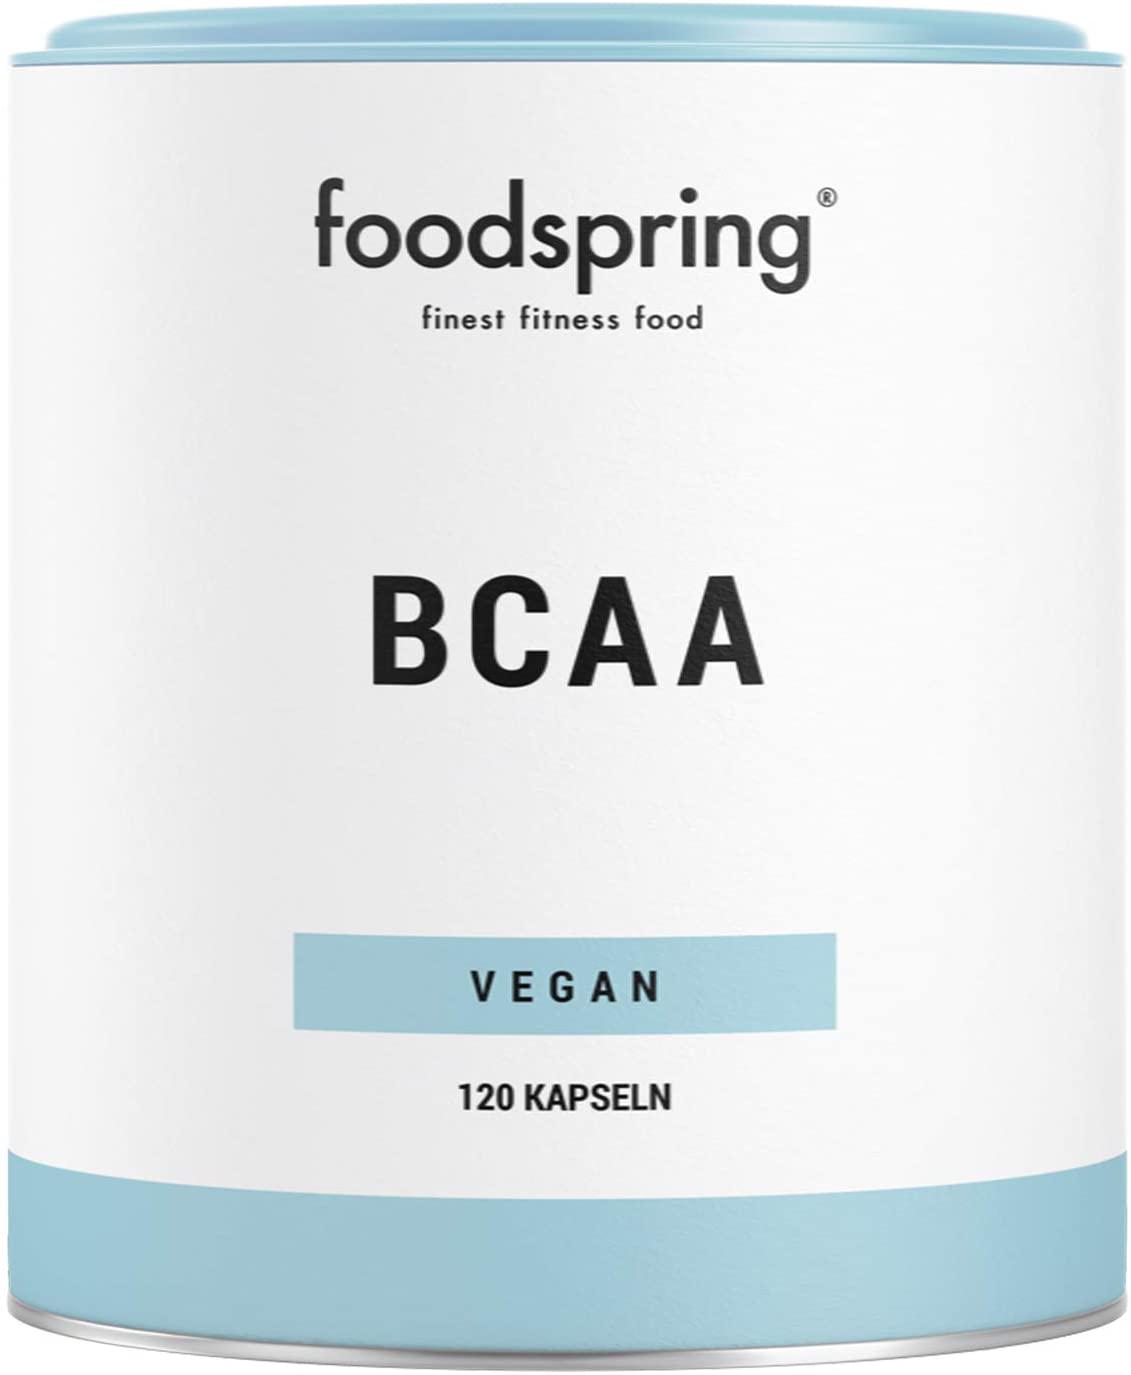 foodspring - BCAA Kapseln